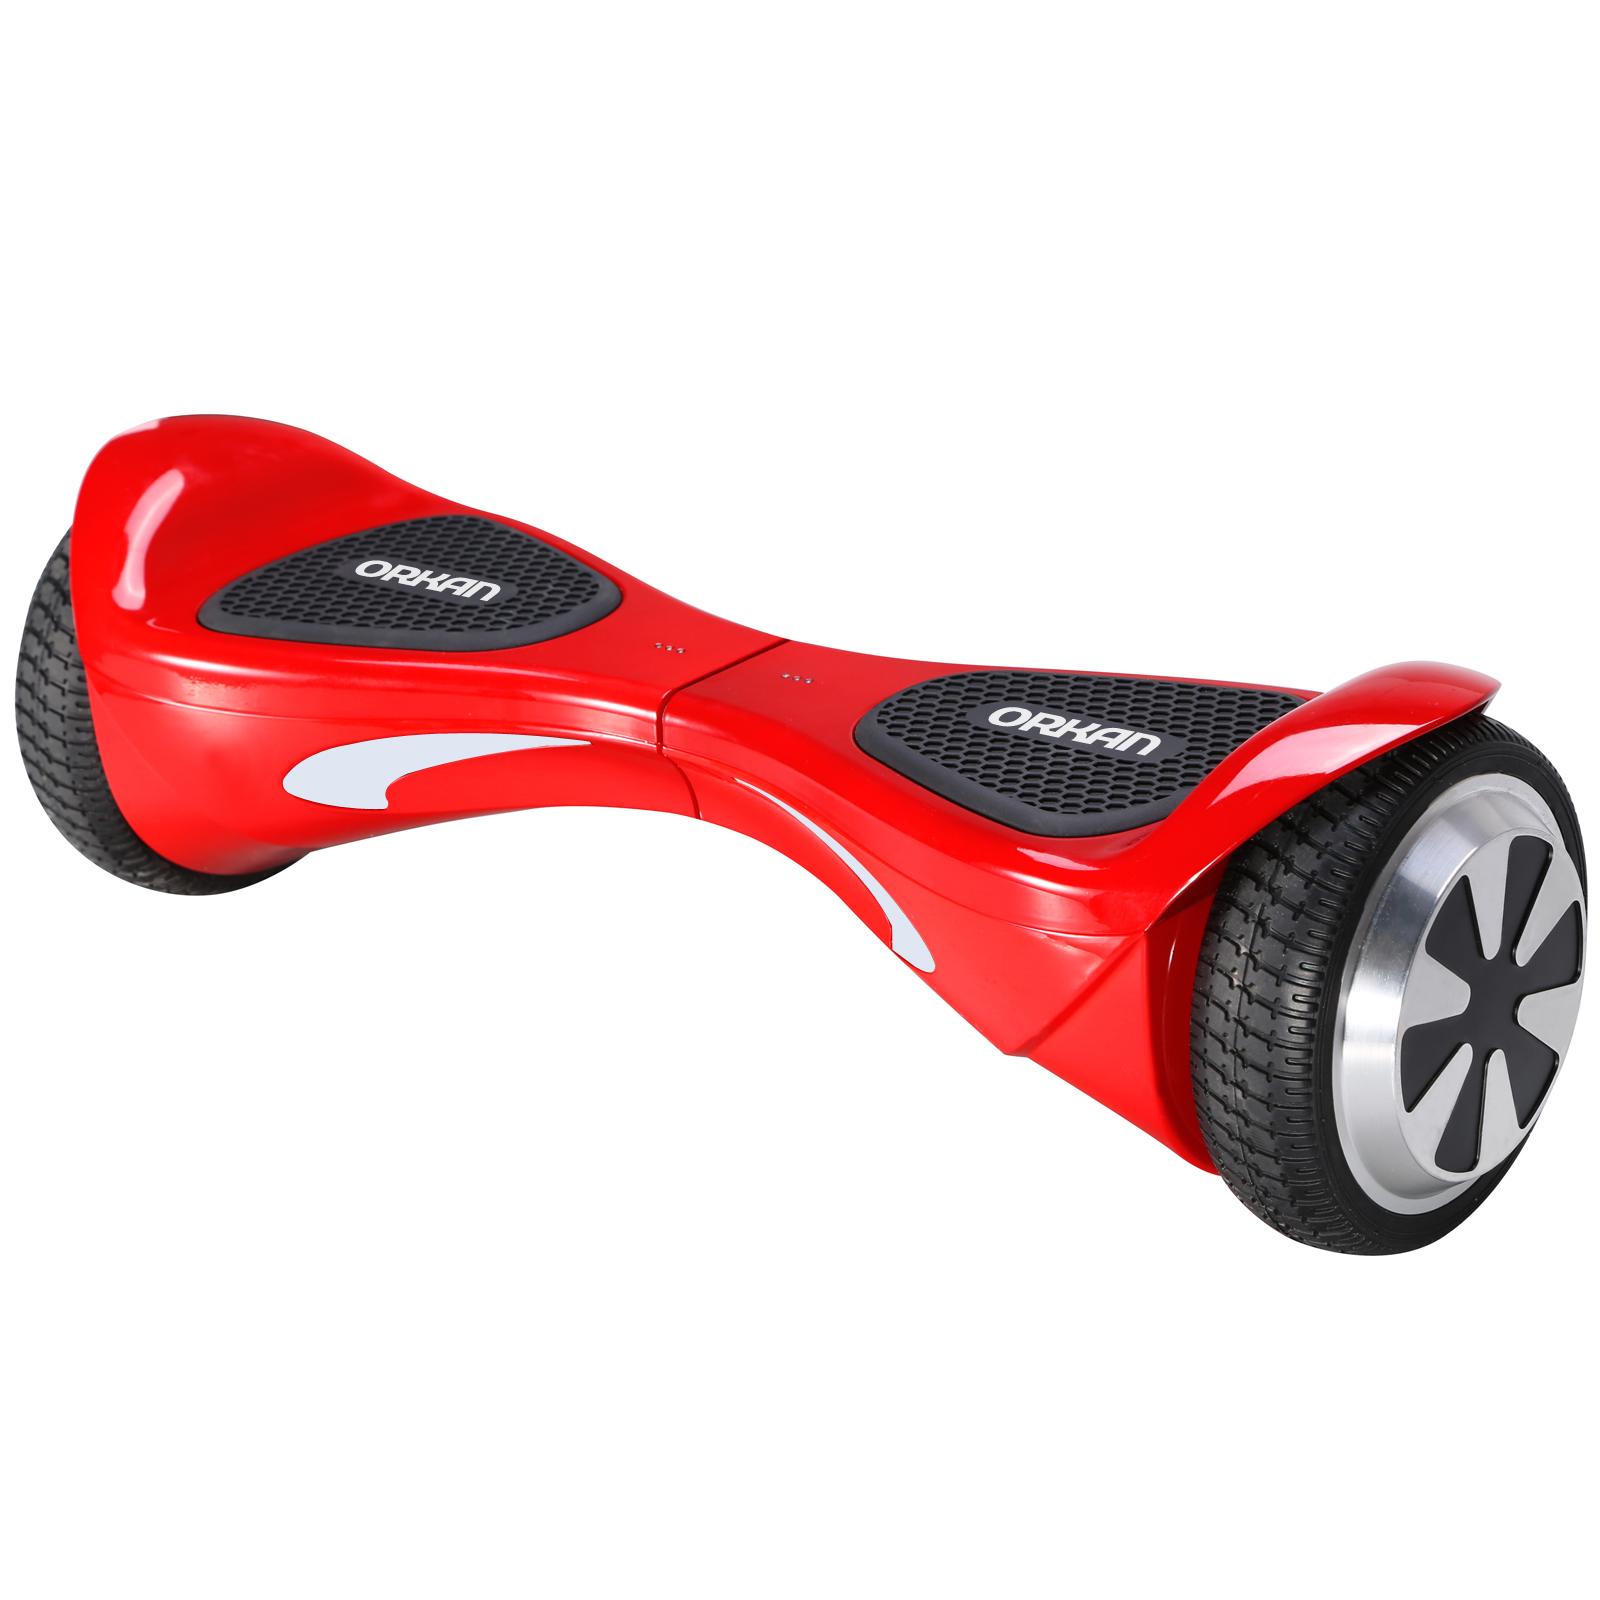 ul2272 approved 6 5 electric self balancing smart scooter. Black Bedroom Furniture Sets. Home Design Ideas